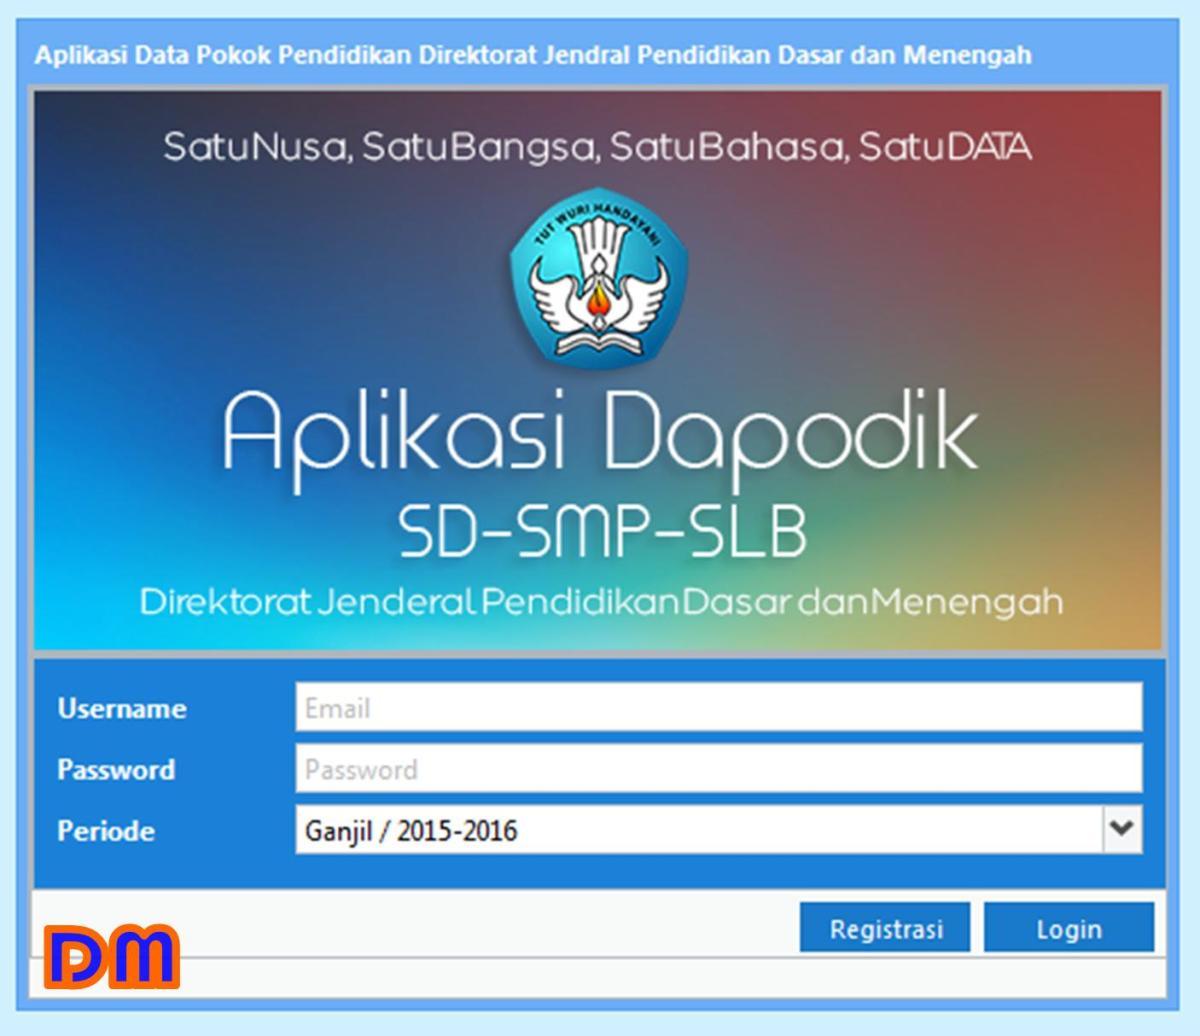 Kirim / Sinkronisasi PMP Dapodik - TENDY DEVELOPER